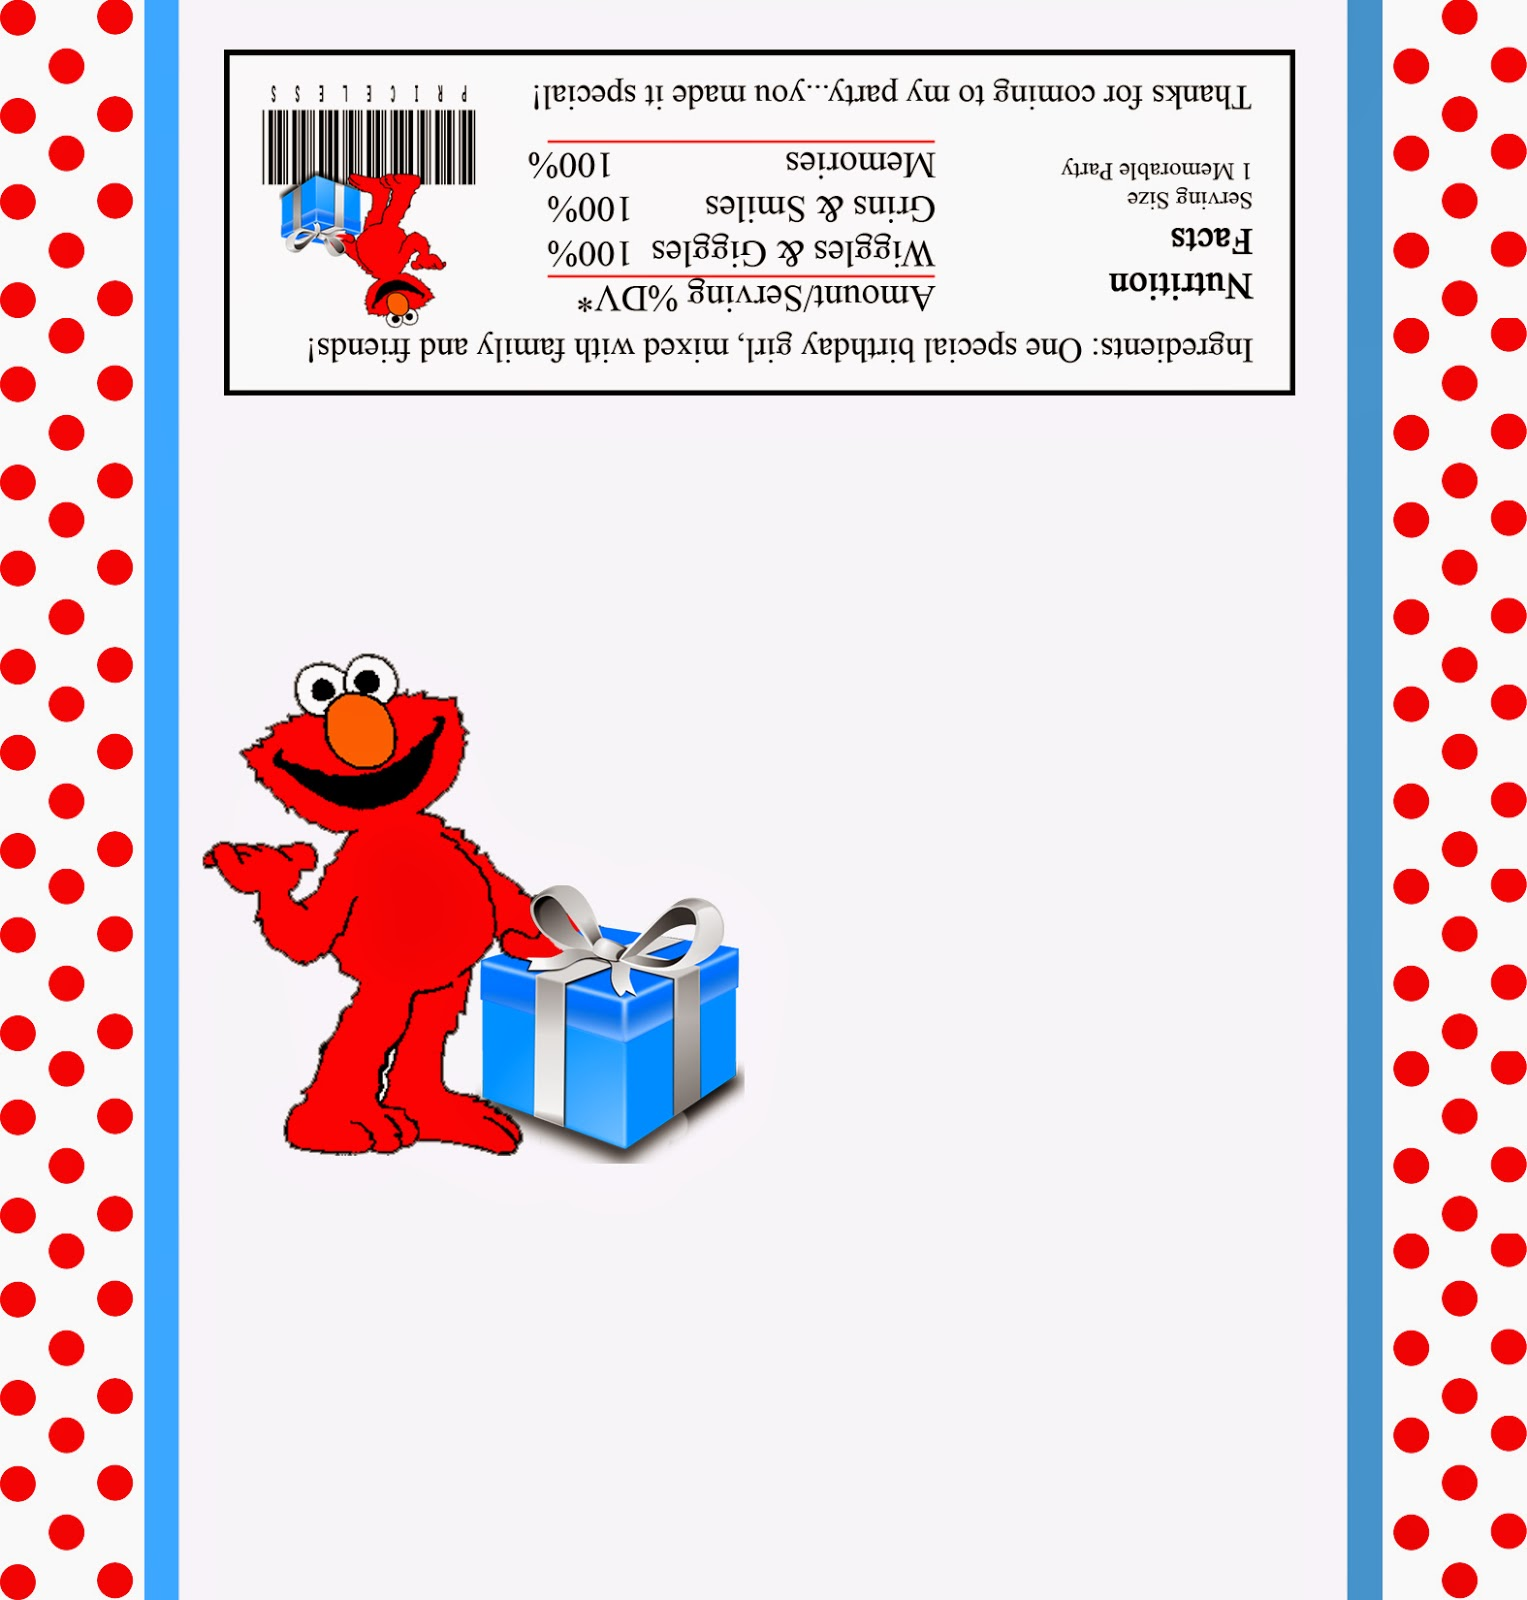 Etiqueta para Chocolates para Fiestas de Elmo, para Imprimir Gratis.